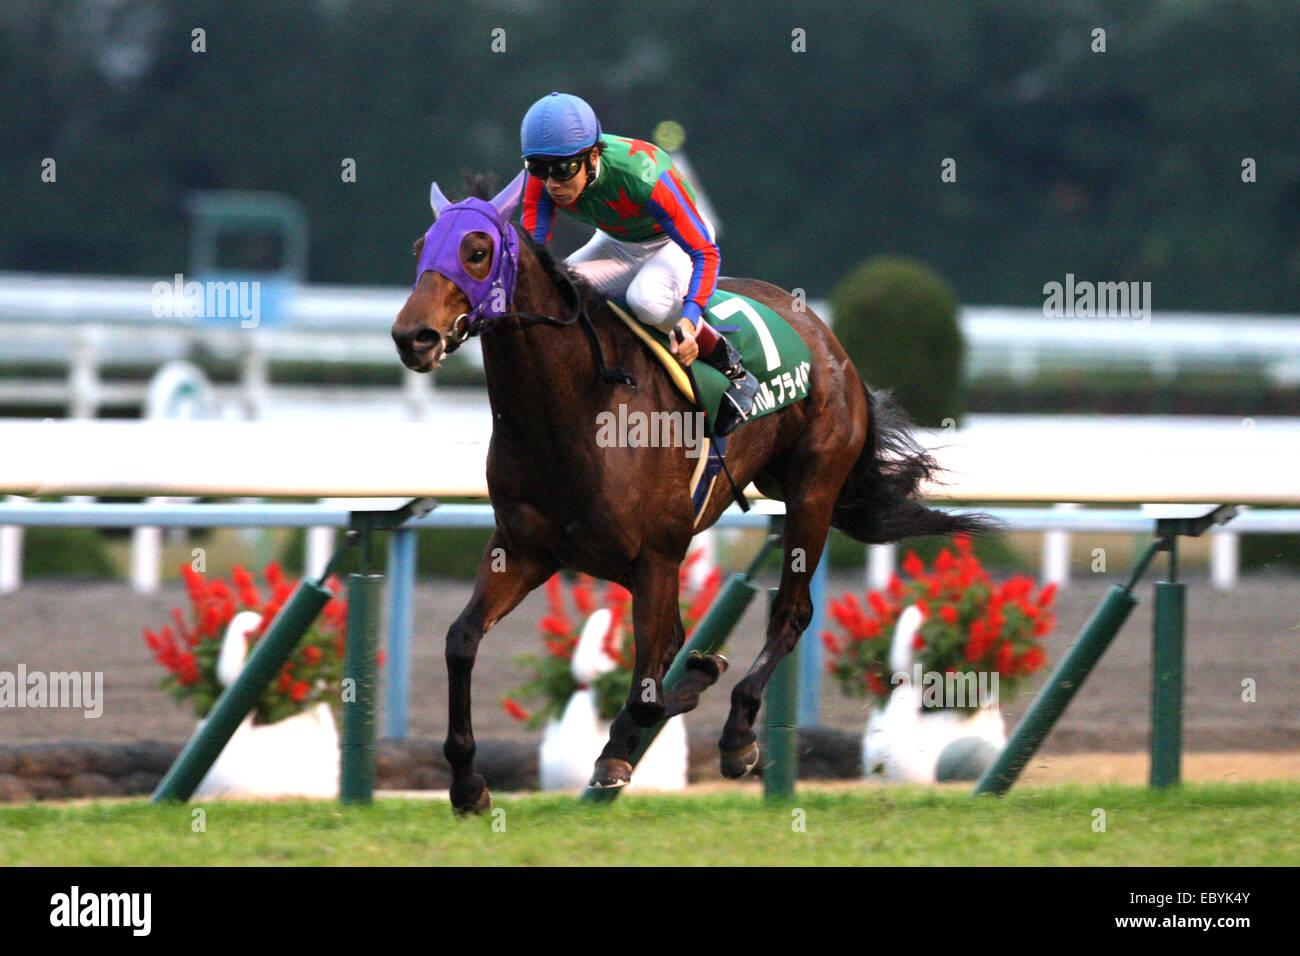 Kyoto, Japan. 30th Nov, 2014. Am Ball Bleiben (Ken Tanaka) Horse Racing : Am Ball Bleiben ridden by Ken Tanaka wins - Stock Image